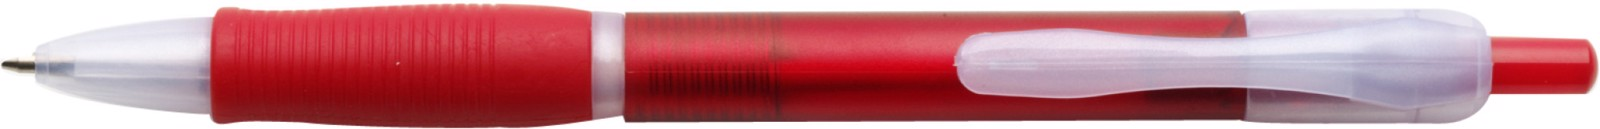 AS ballpen - Red